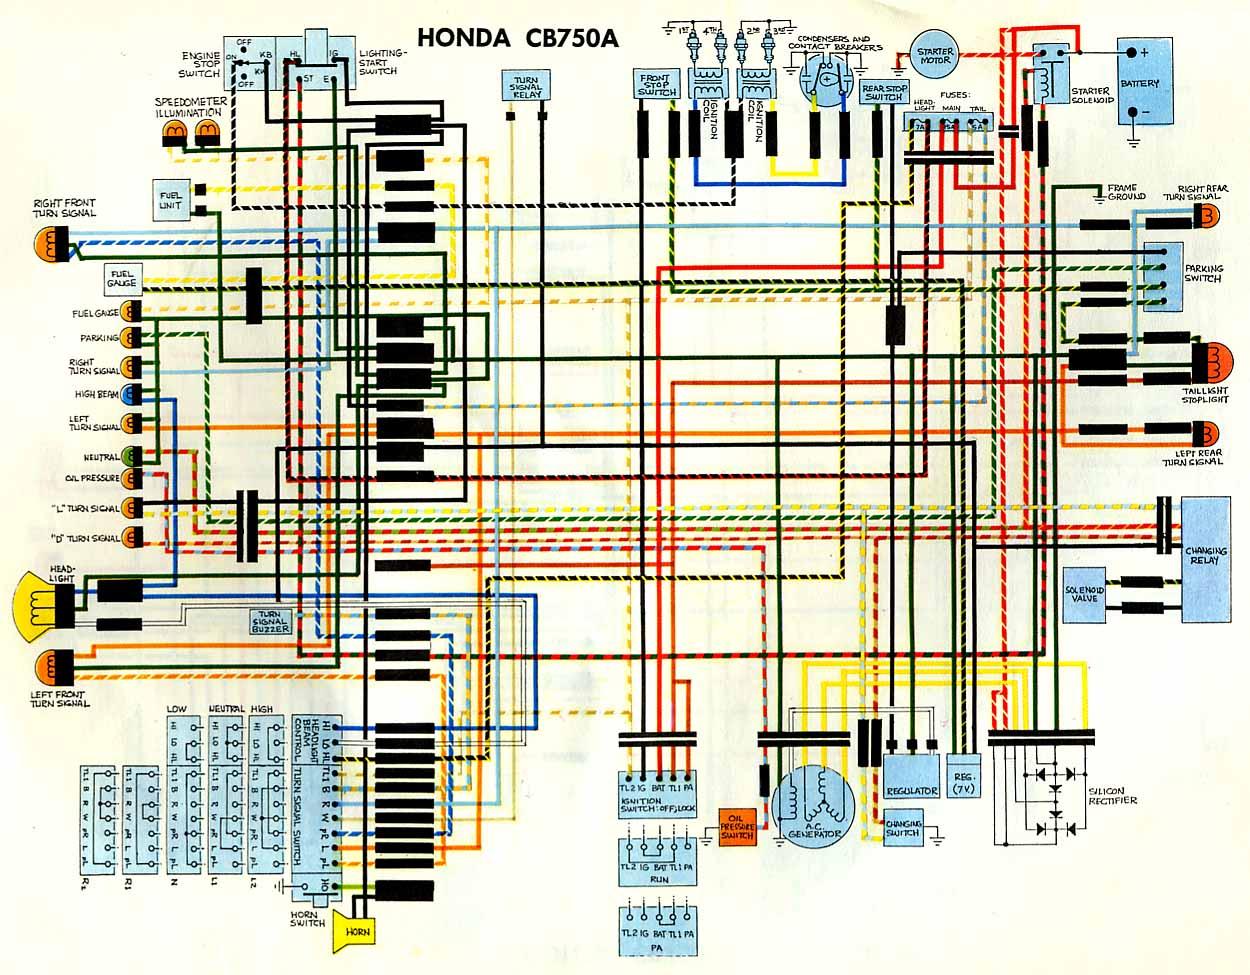 hight resolution of  hondamatic cb750a wiring diagram eurozone wiring diagram yamaha xt500